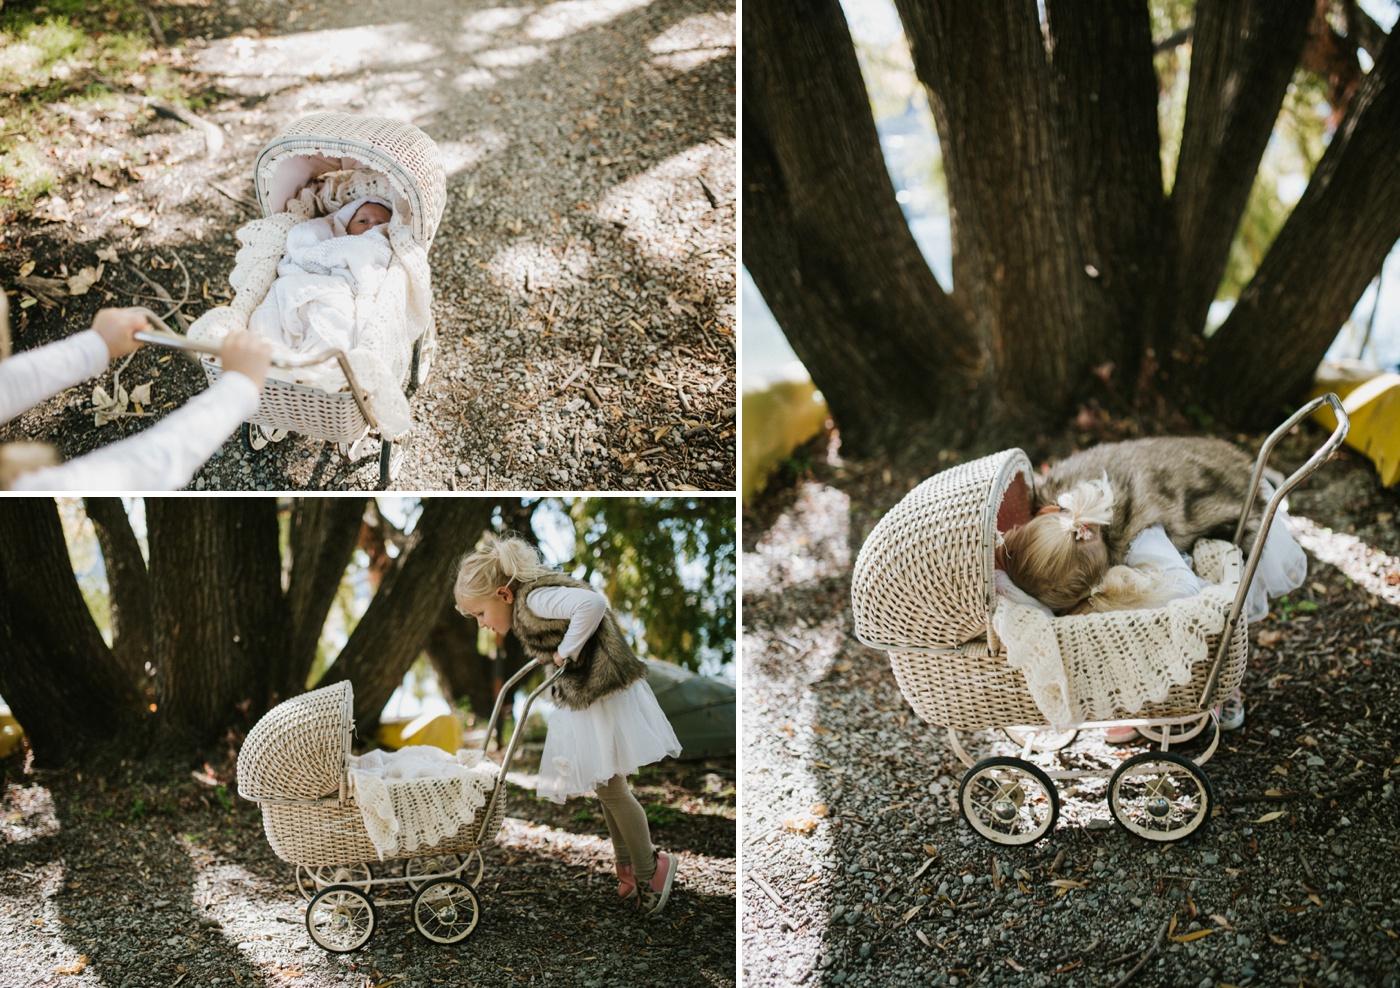 Blake-Lily-Rolig-Lekfull-Familjesession-Familjefotograf-Stockholm-Orebro_31